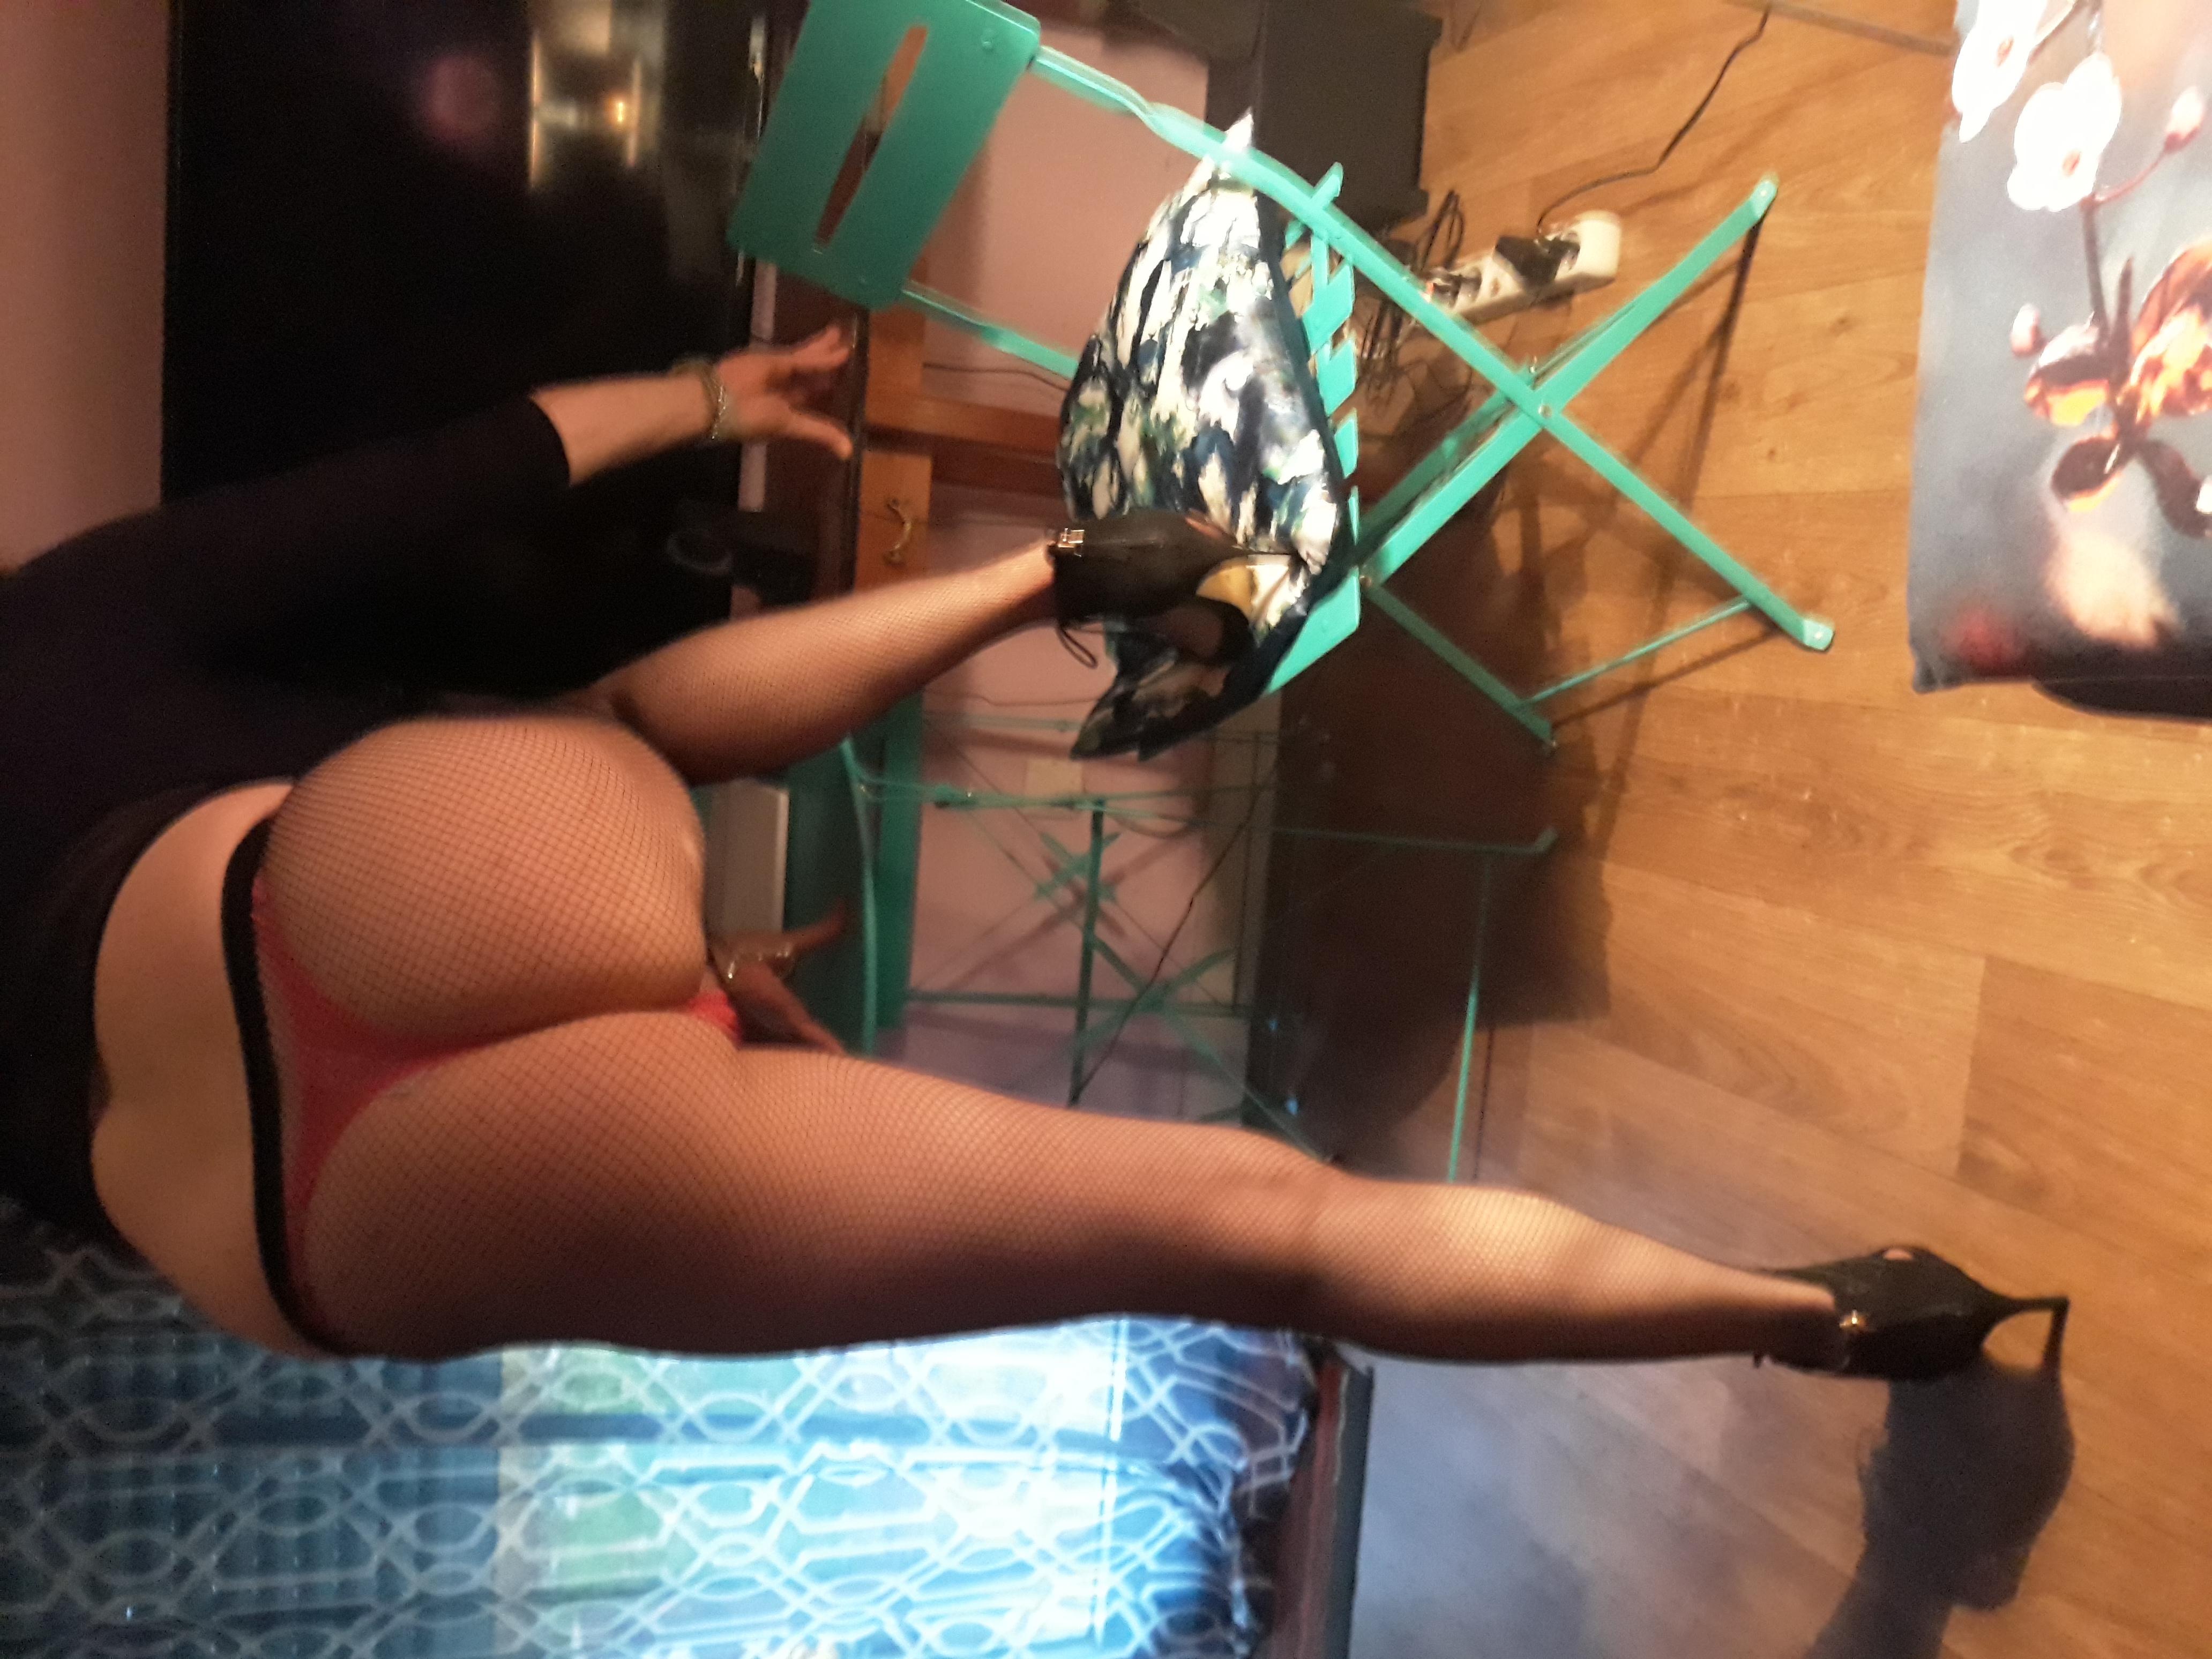 >Orchidee massage sensuel - Escort Poitiers